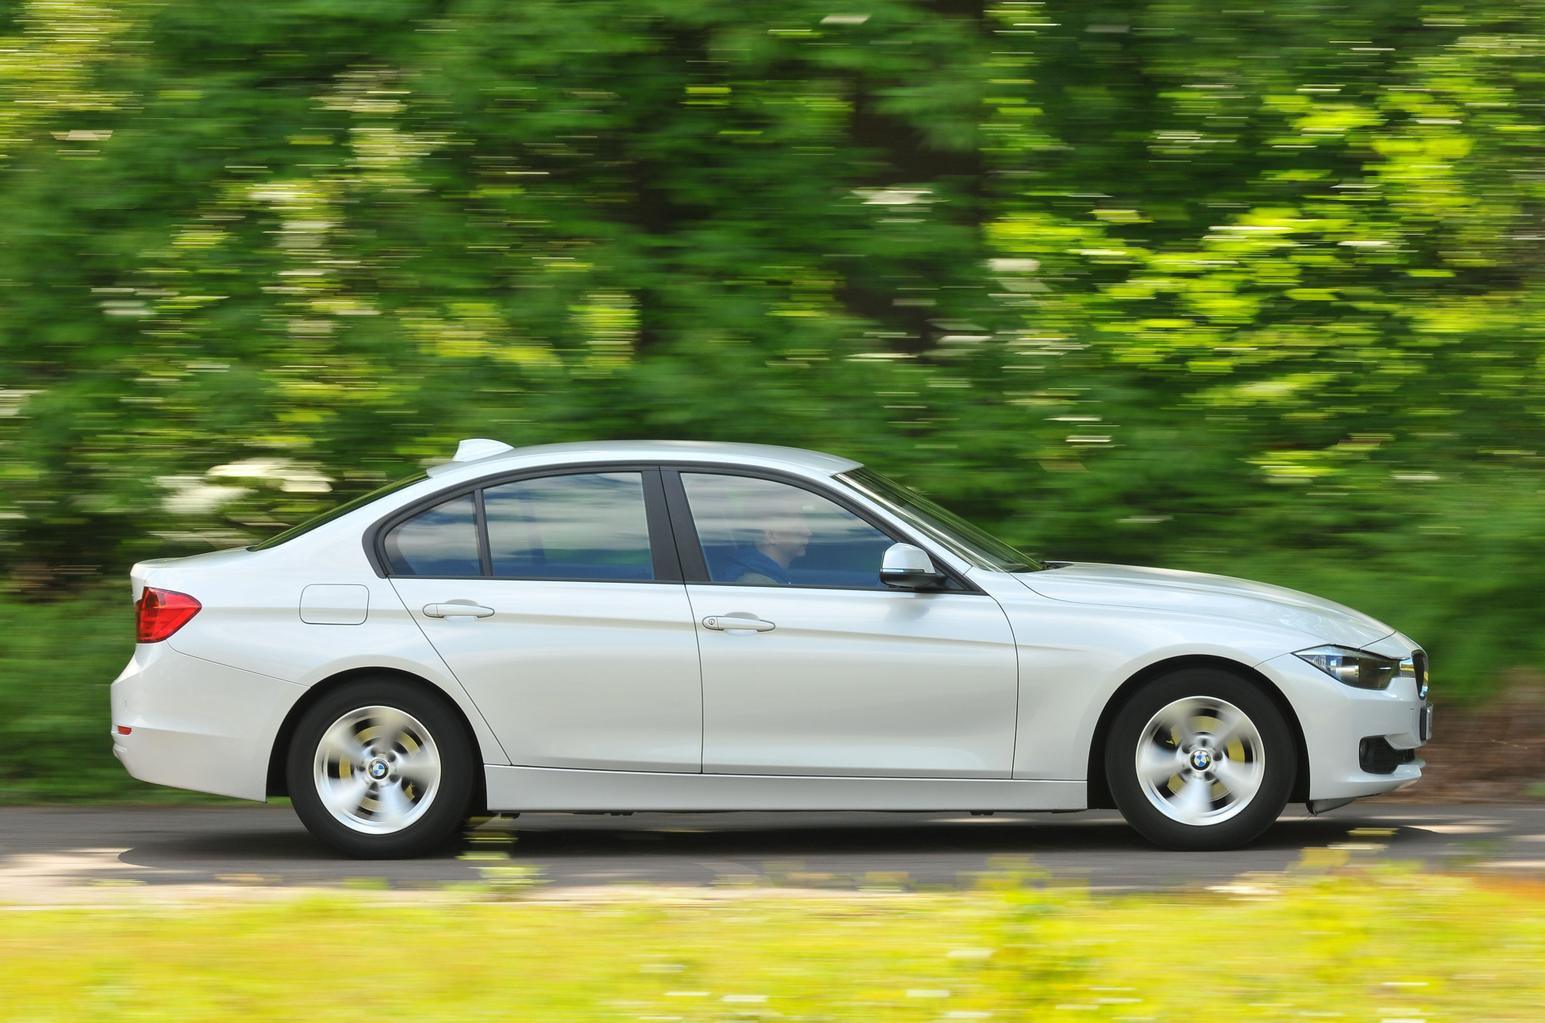 BMW 3 Series petrol side profile